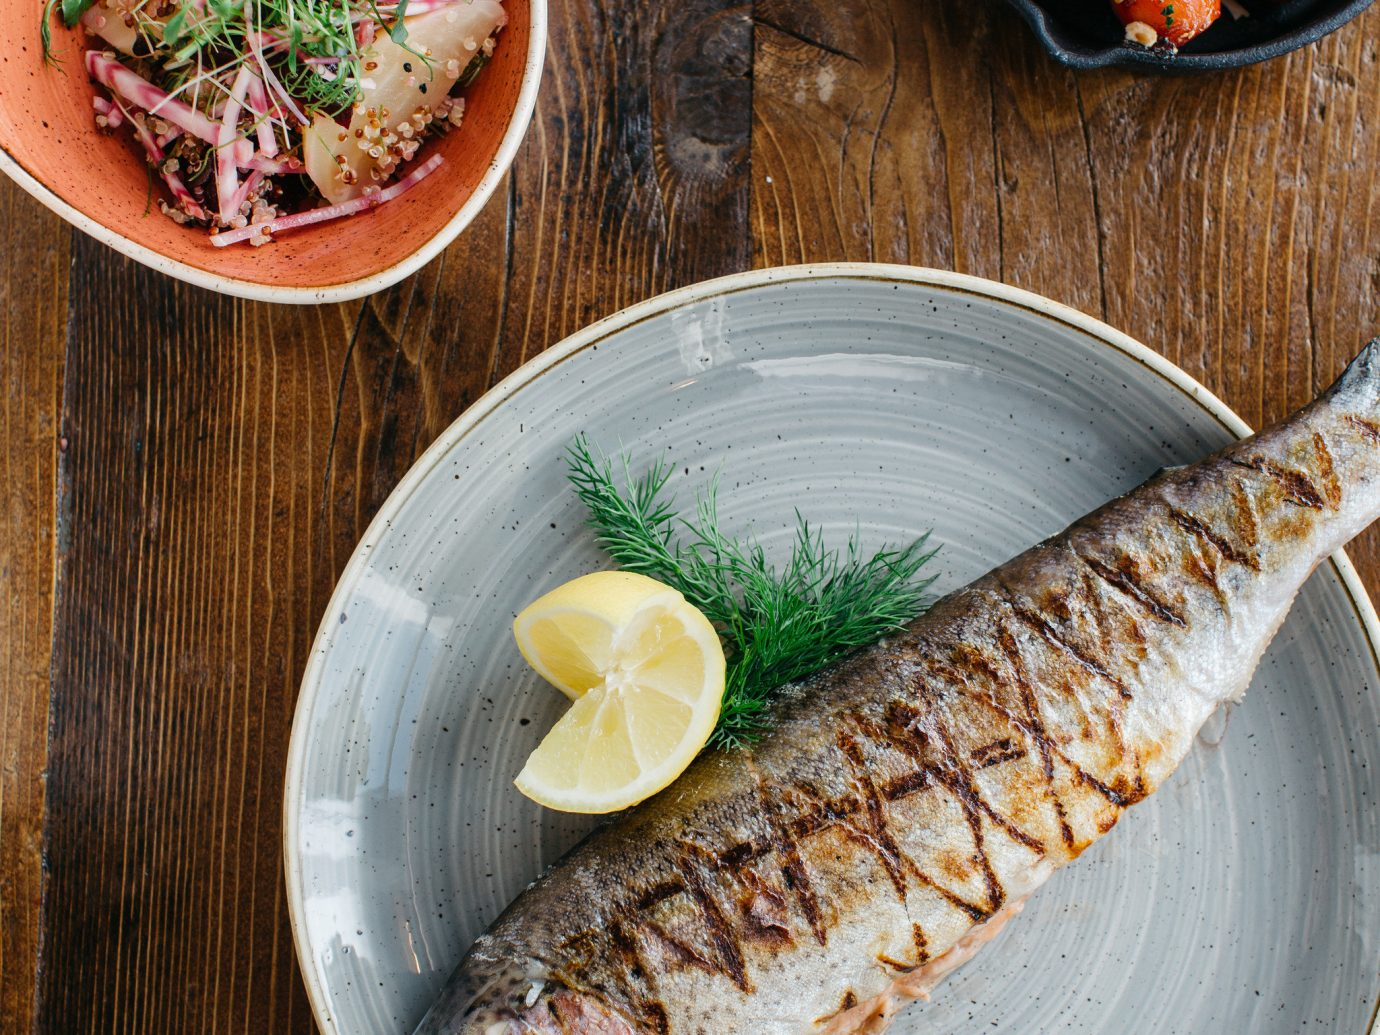 Romance Trip Ideas plate table food wooden dish fish sardine produce forage fish meat cuisine vegetable herring slice meal sliced